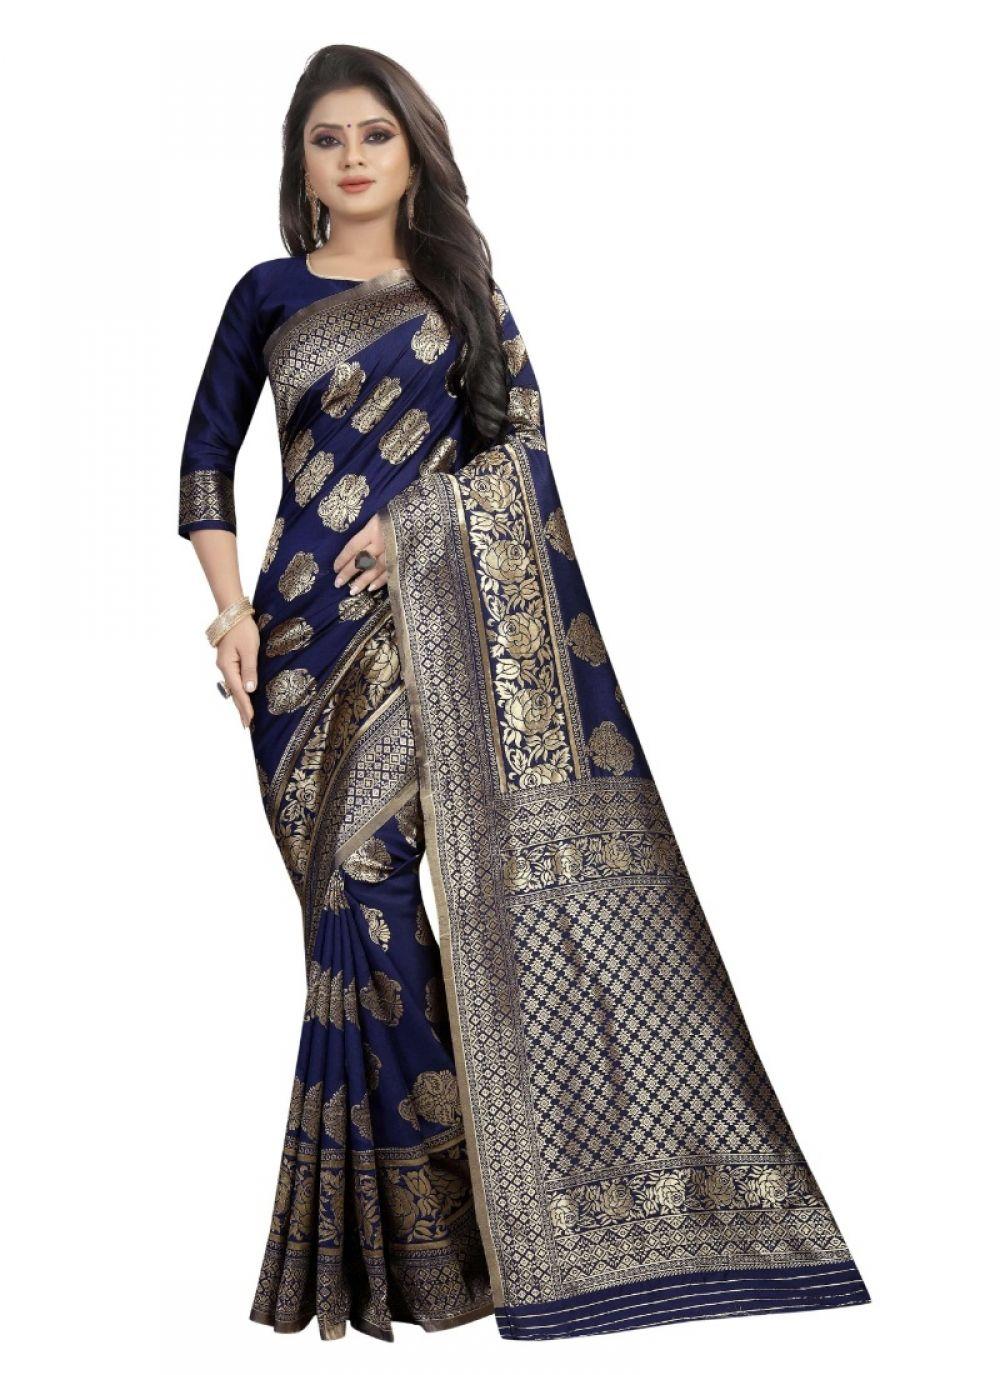 Generic Women's Kota Banarasi Silk Saree with Blouse (NavyBlue,5-6 mtrs)  Price: 954 & FREE Shipping  #hashtag3